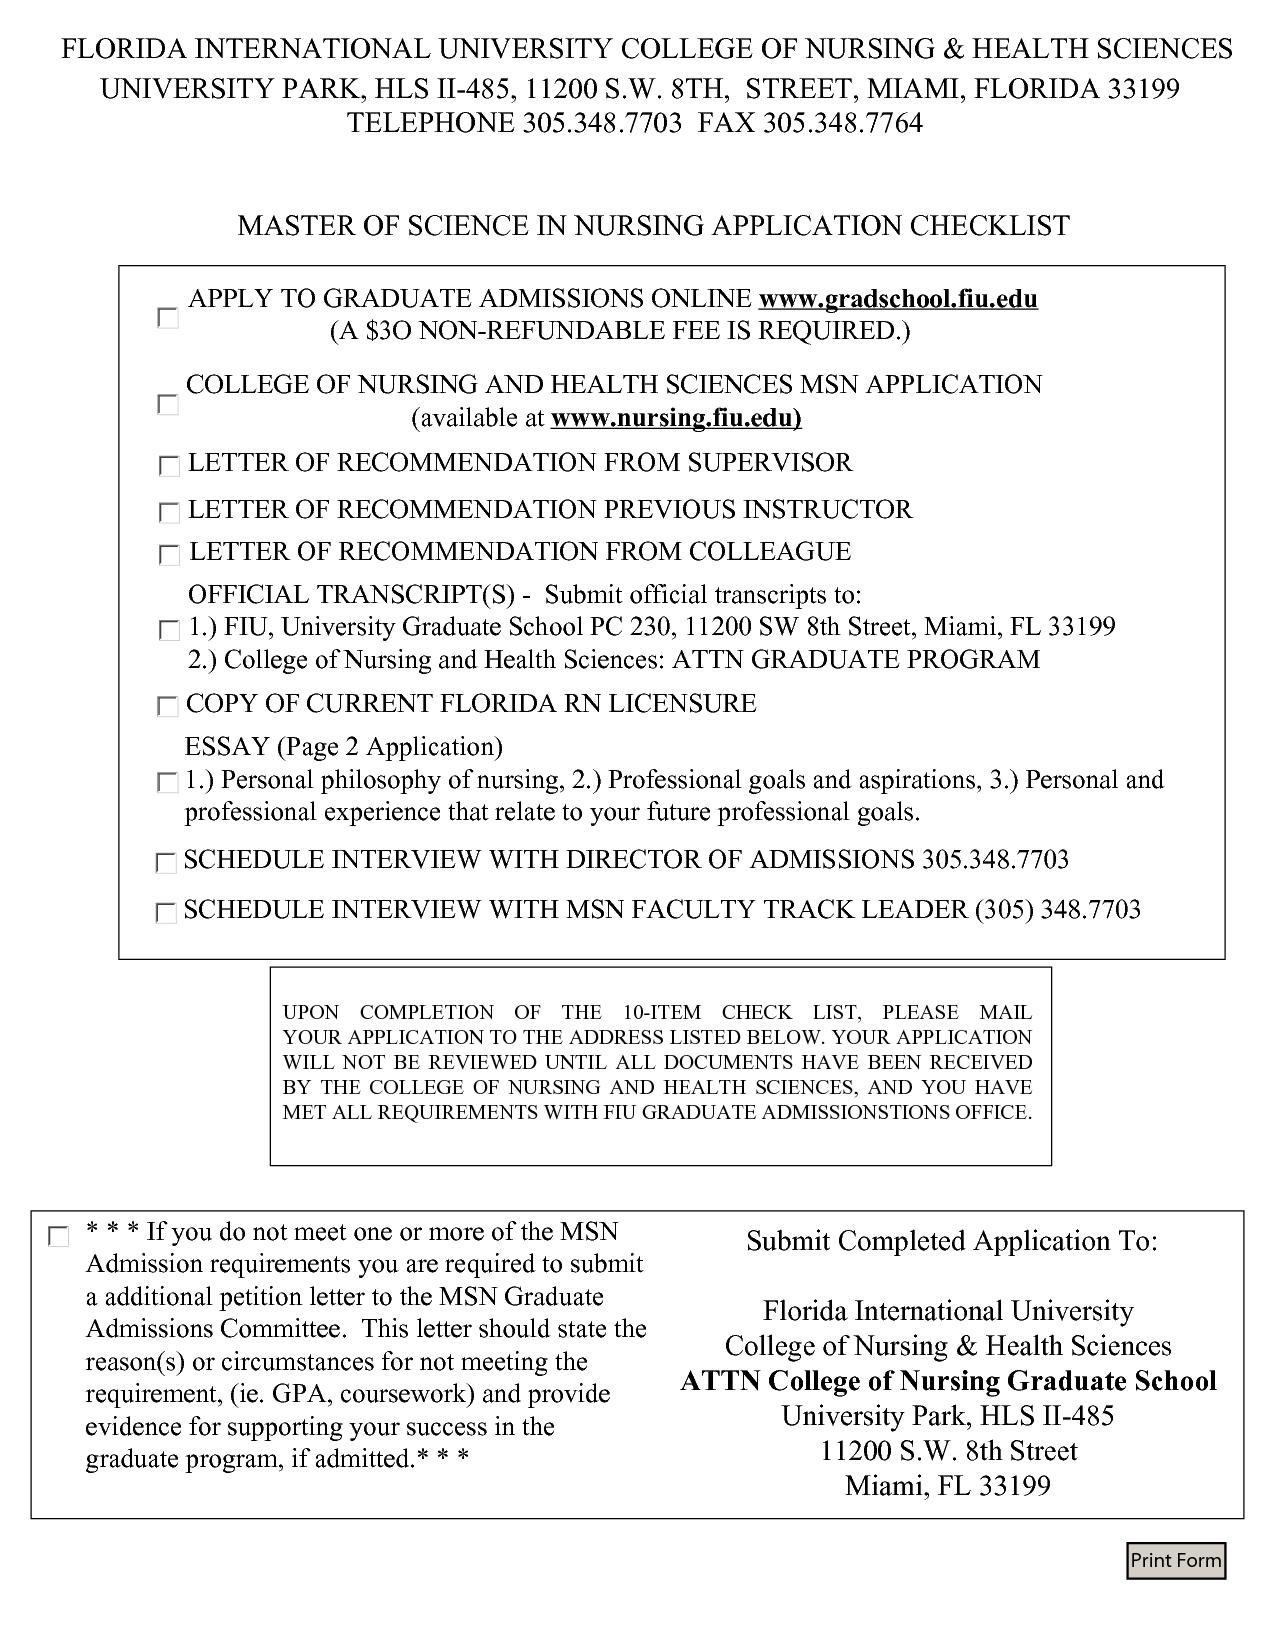 graduate school admission essay nurse practitioner Msn nurse practitioner admission requirements a written essay meet the university graduate school english language proficiency requirements.